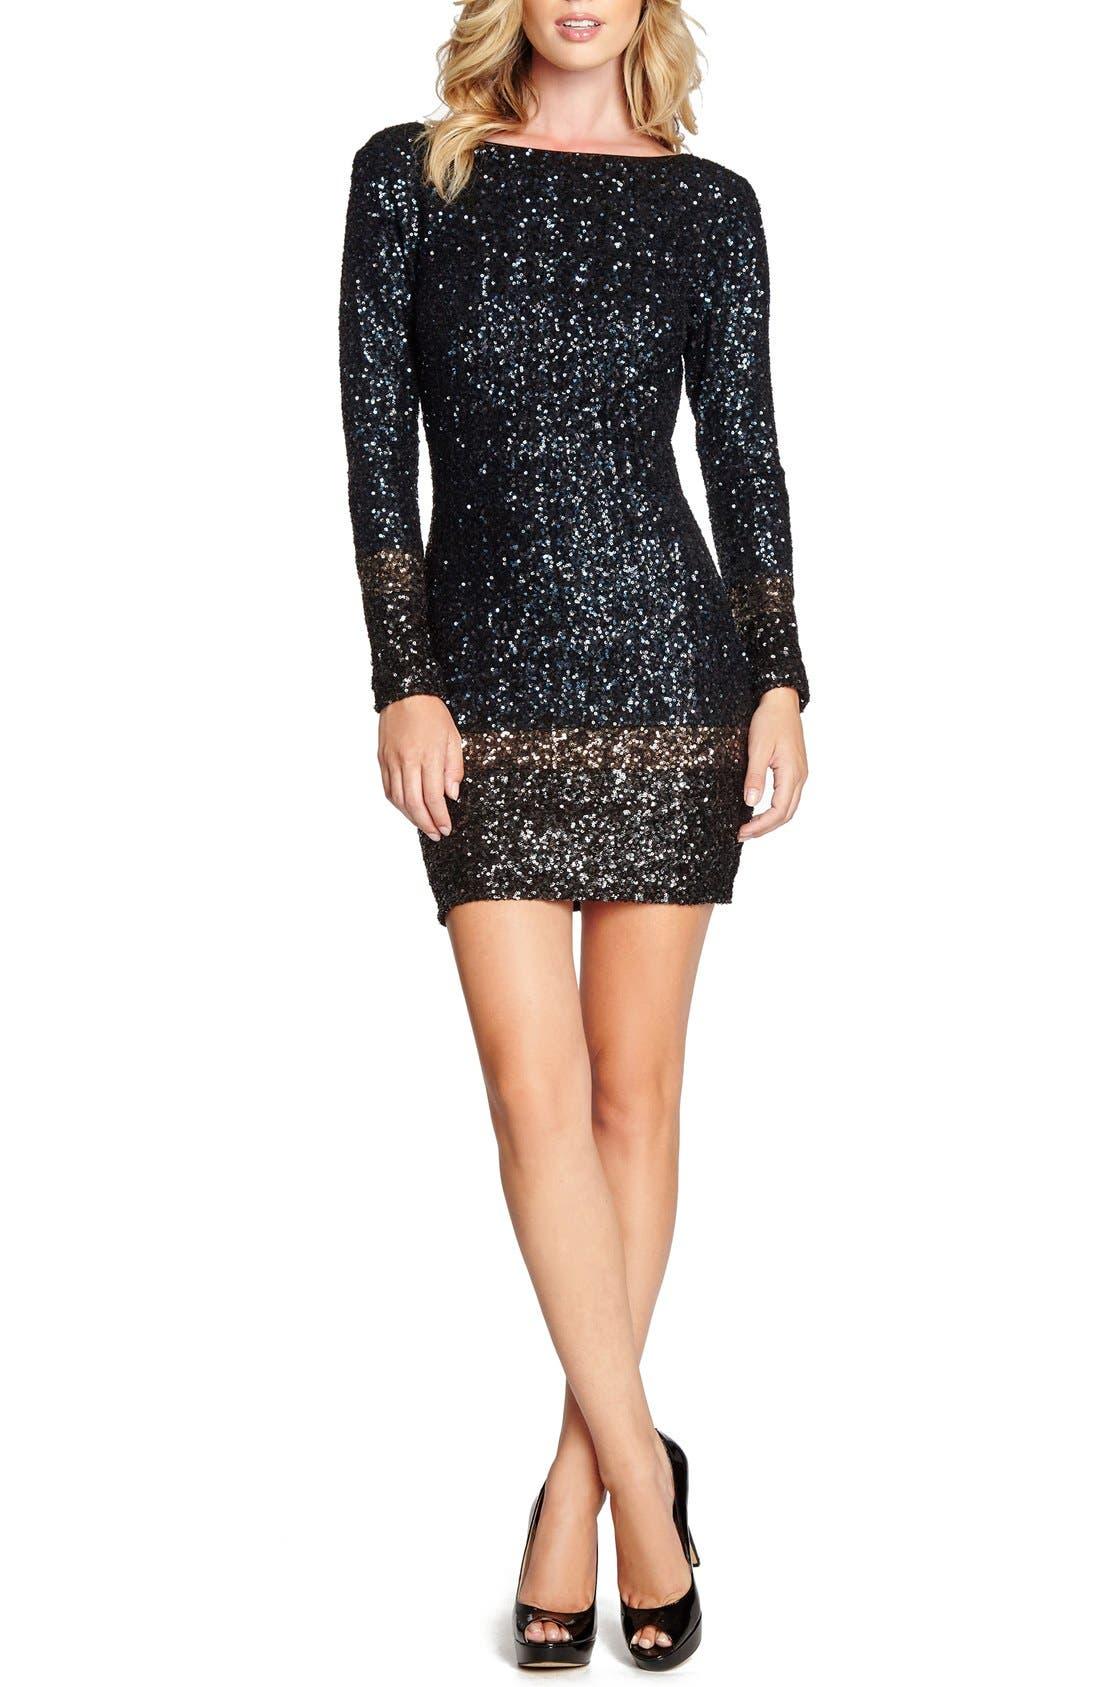 Main Image - Dress the Population 'Patricia' Open Back Sequin Minidress